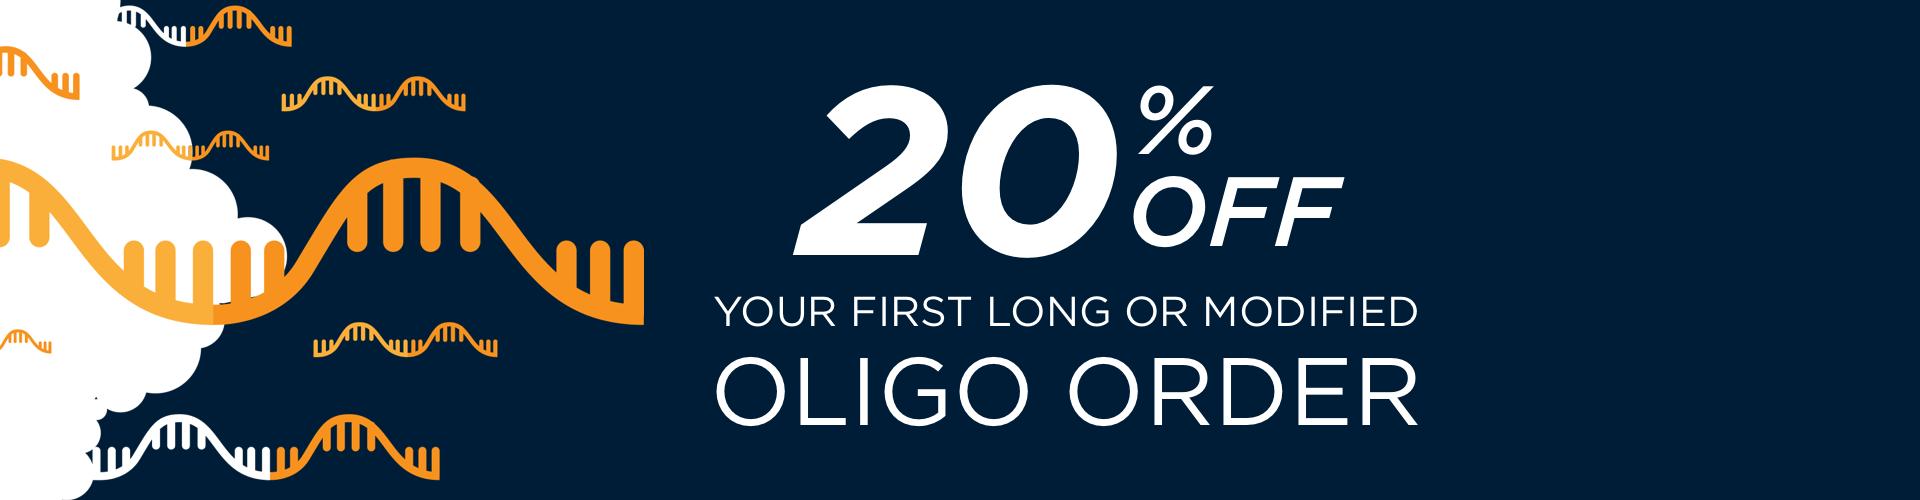 Oligo_Landing_page_20percent_Long.png